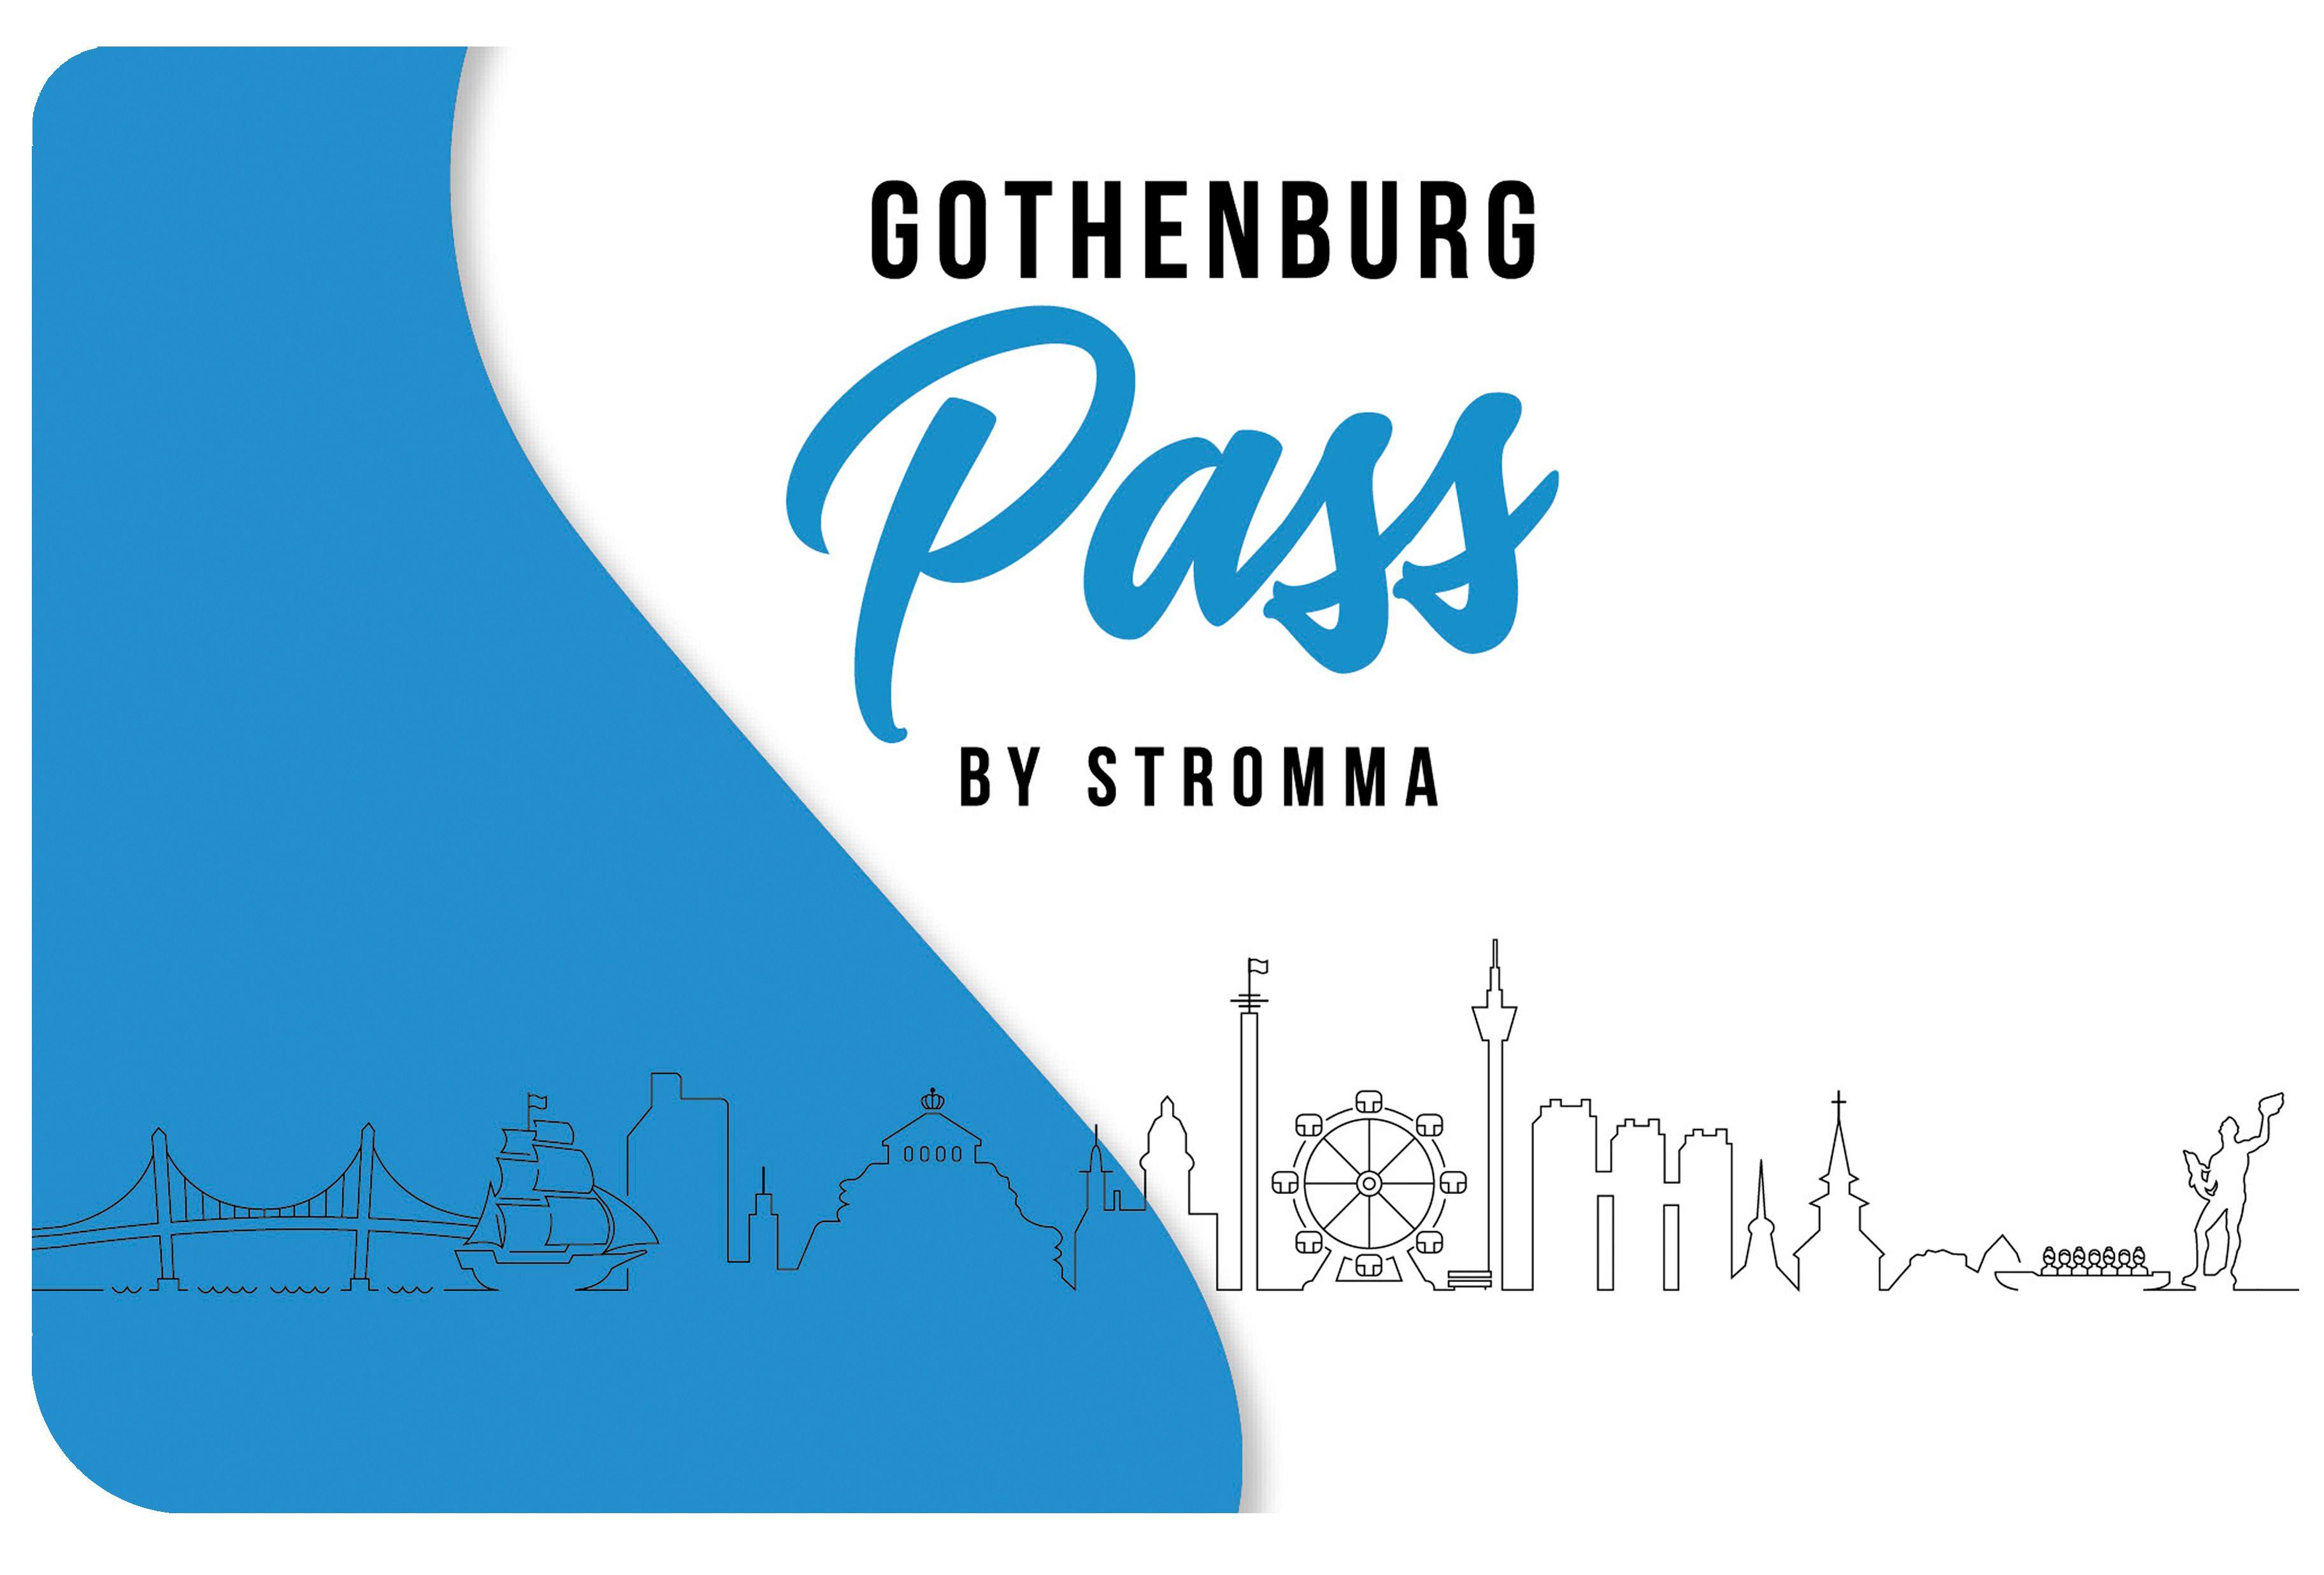 Göteborgspass